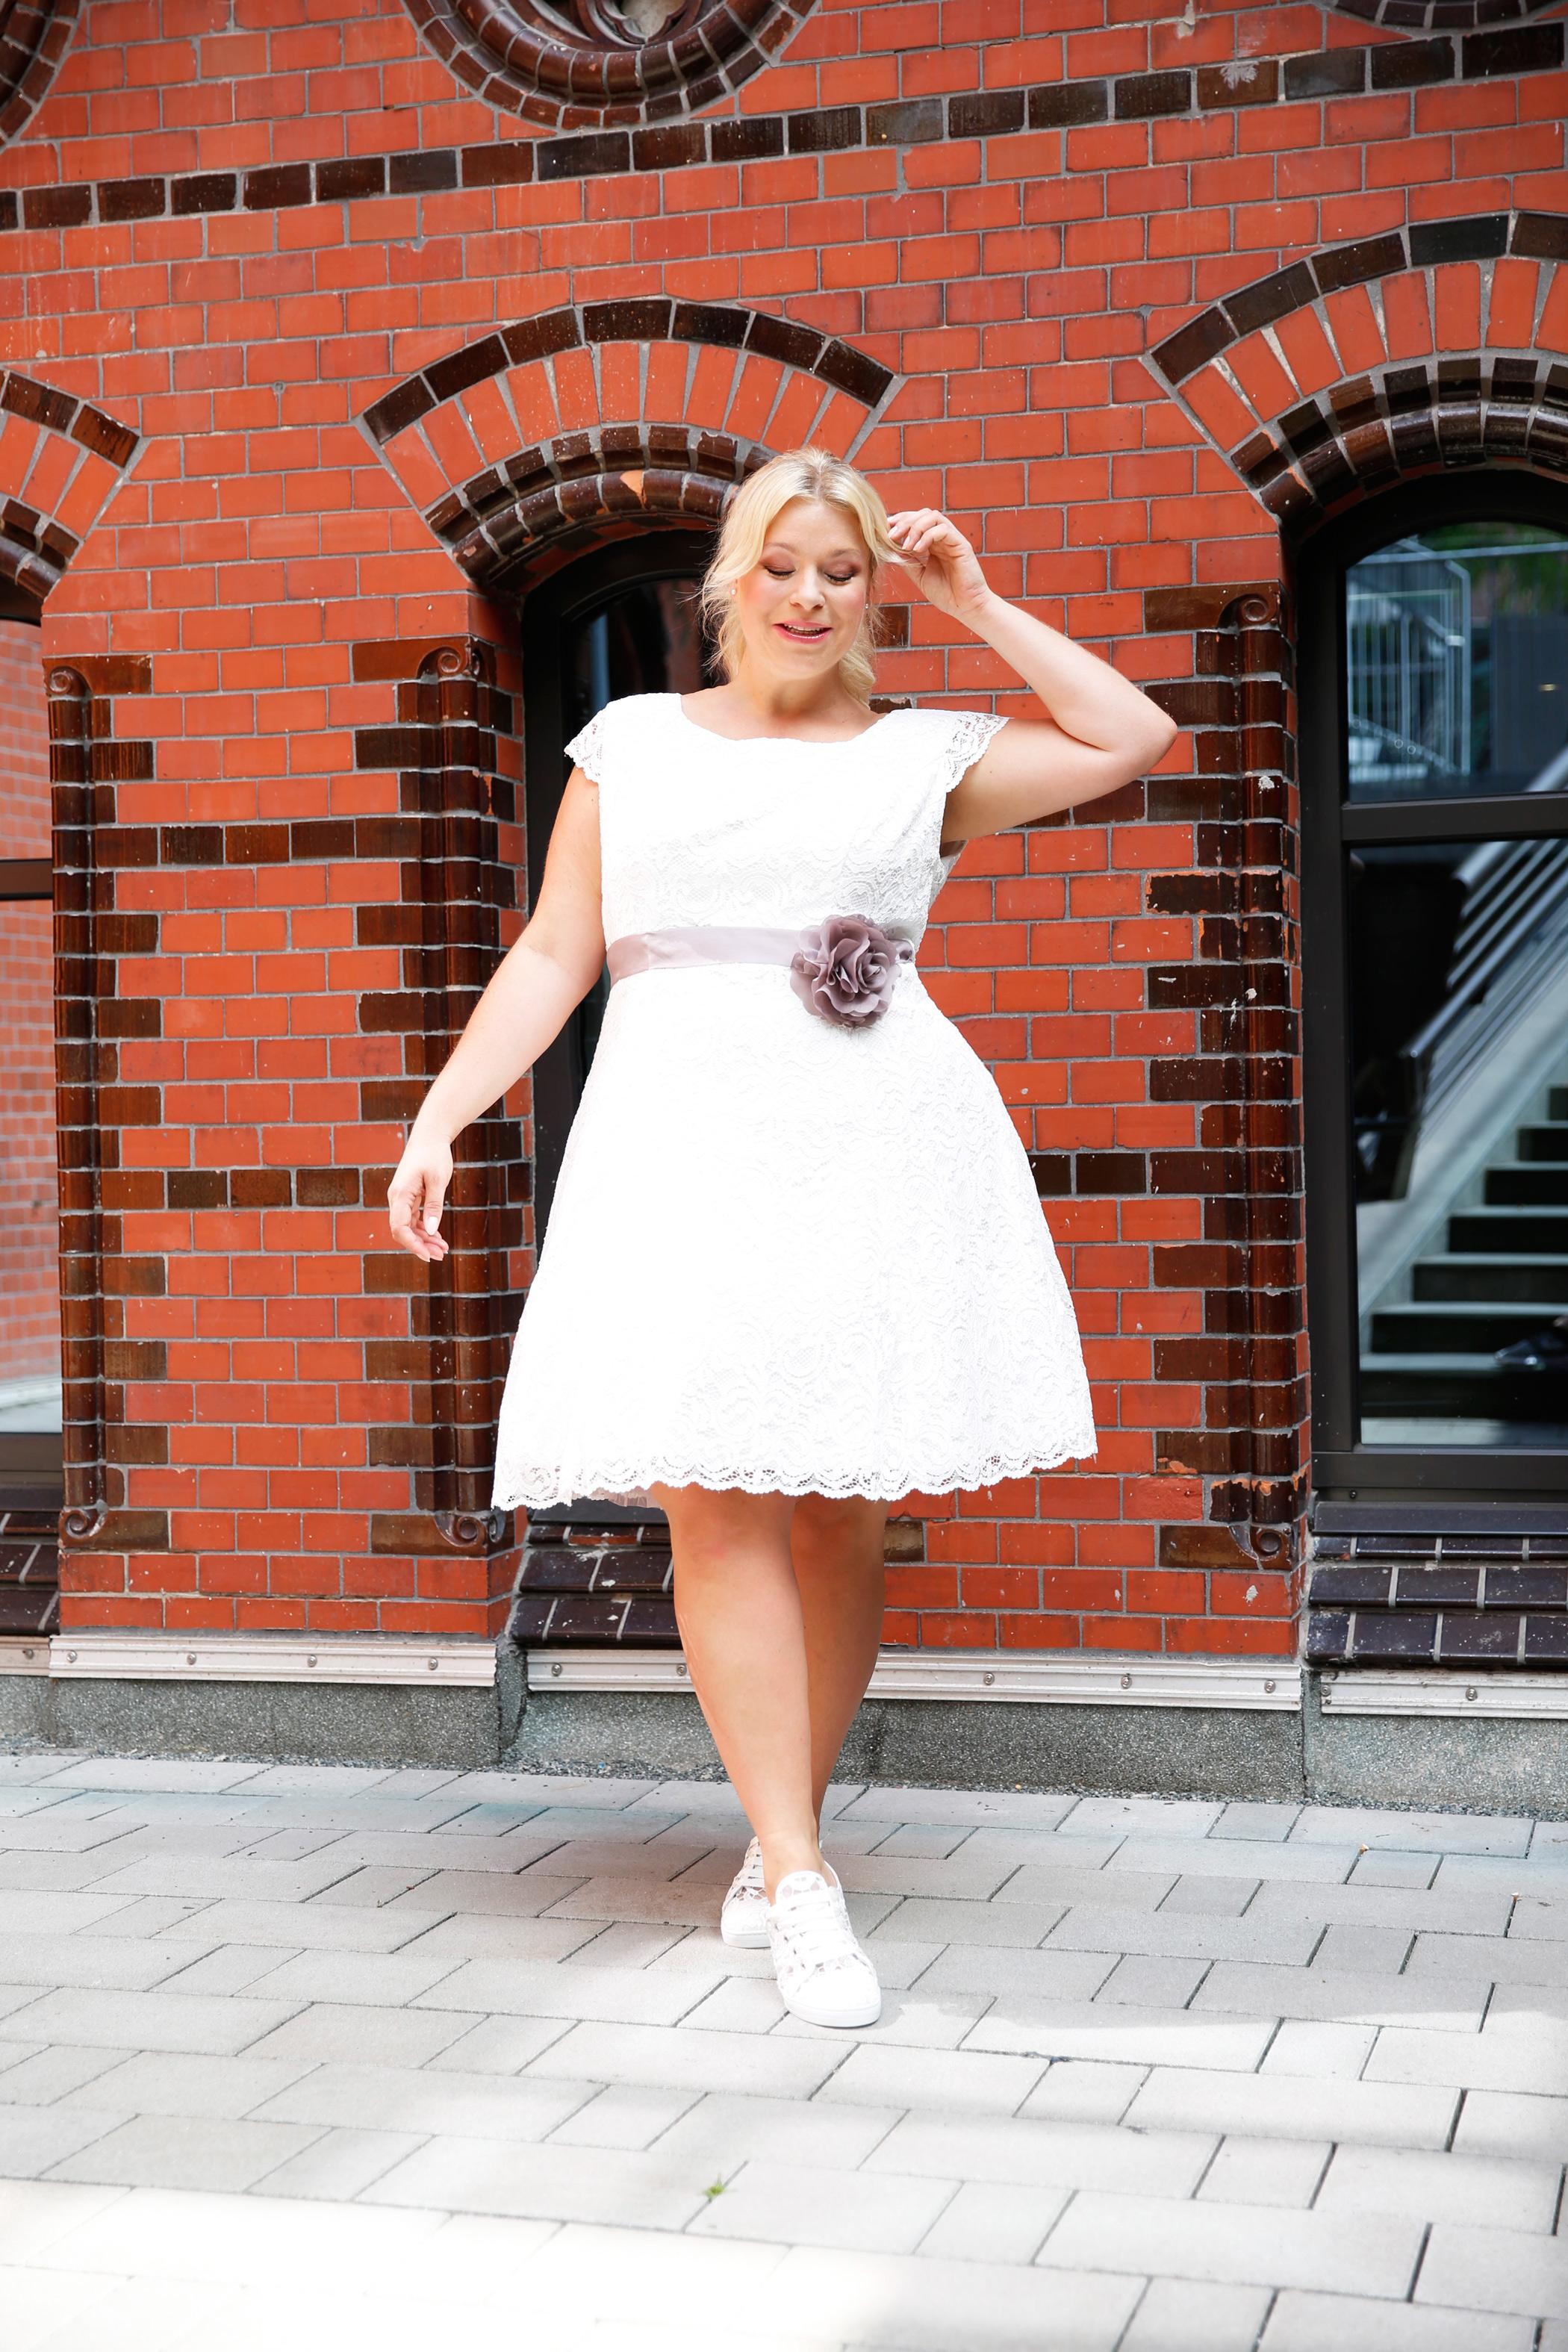 Caterina-pogorzelski-Megabambi-PLussizemodel-Bloggerin-Berlin-braut-plus-size-curvy